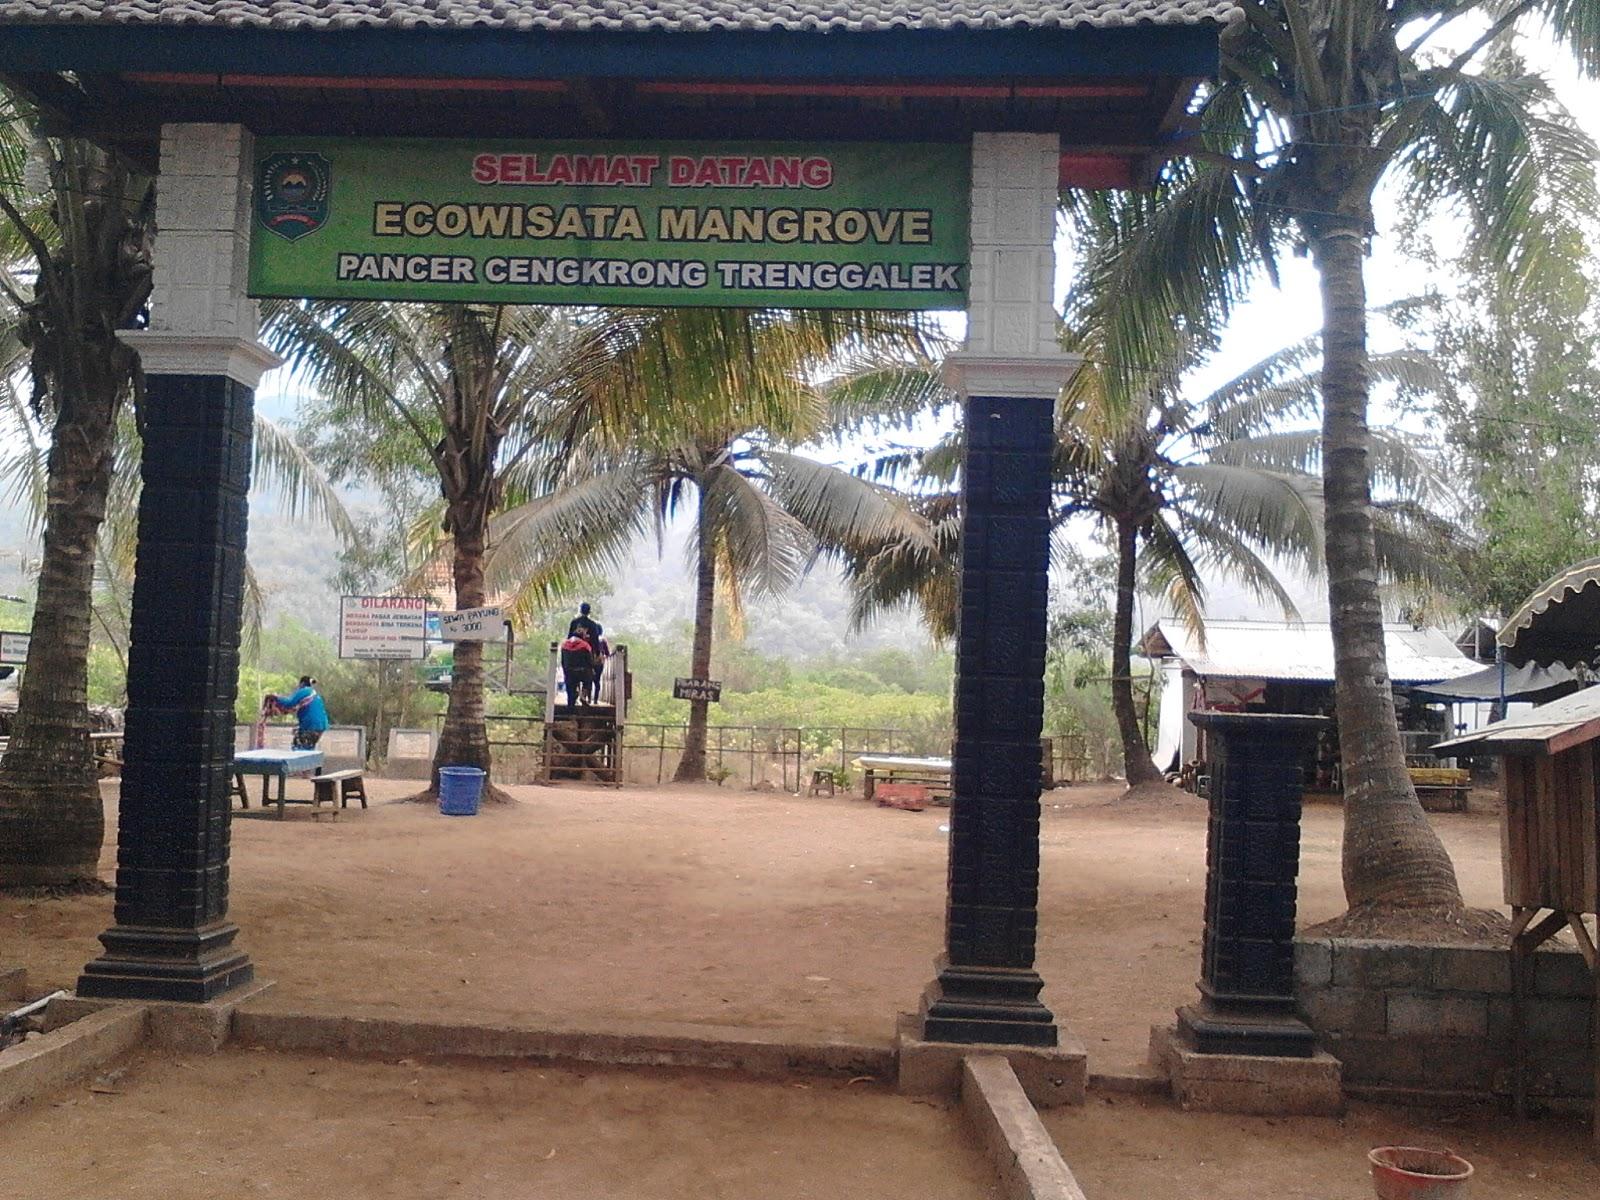 Hutan Mangrove Pancer Cengkrong Trenggalek Rayi Agustina Kab